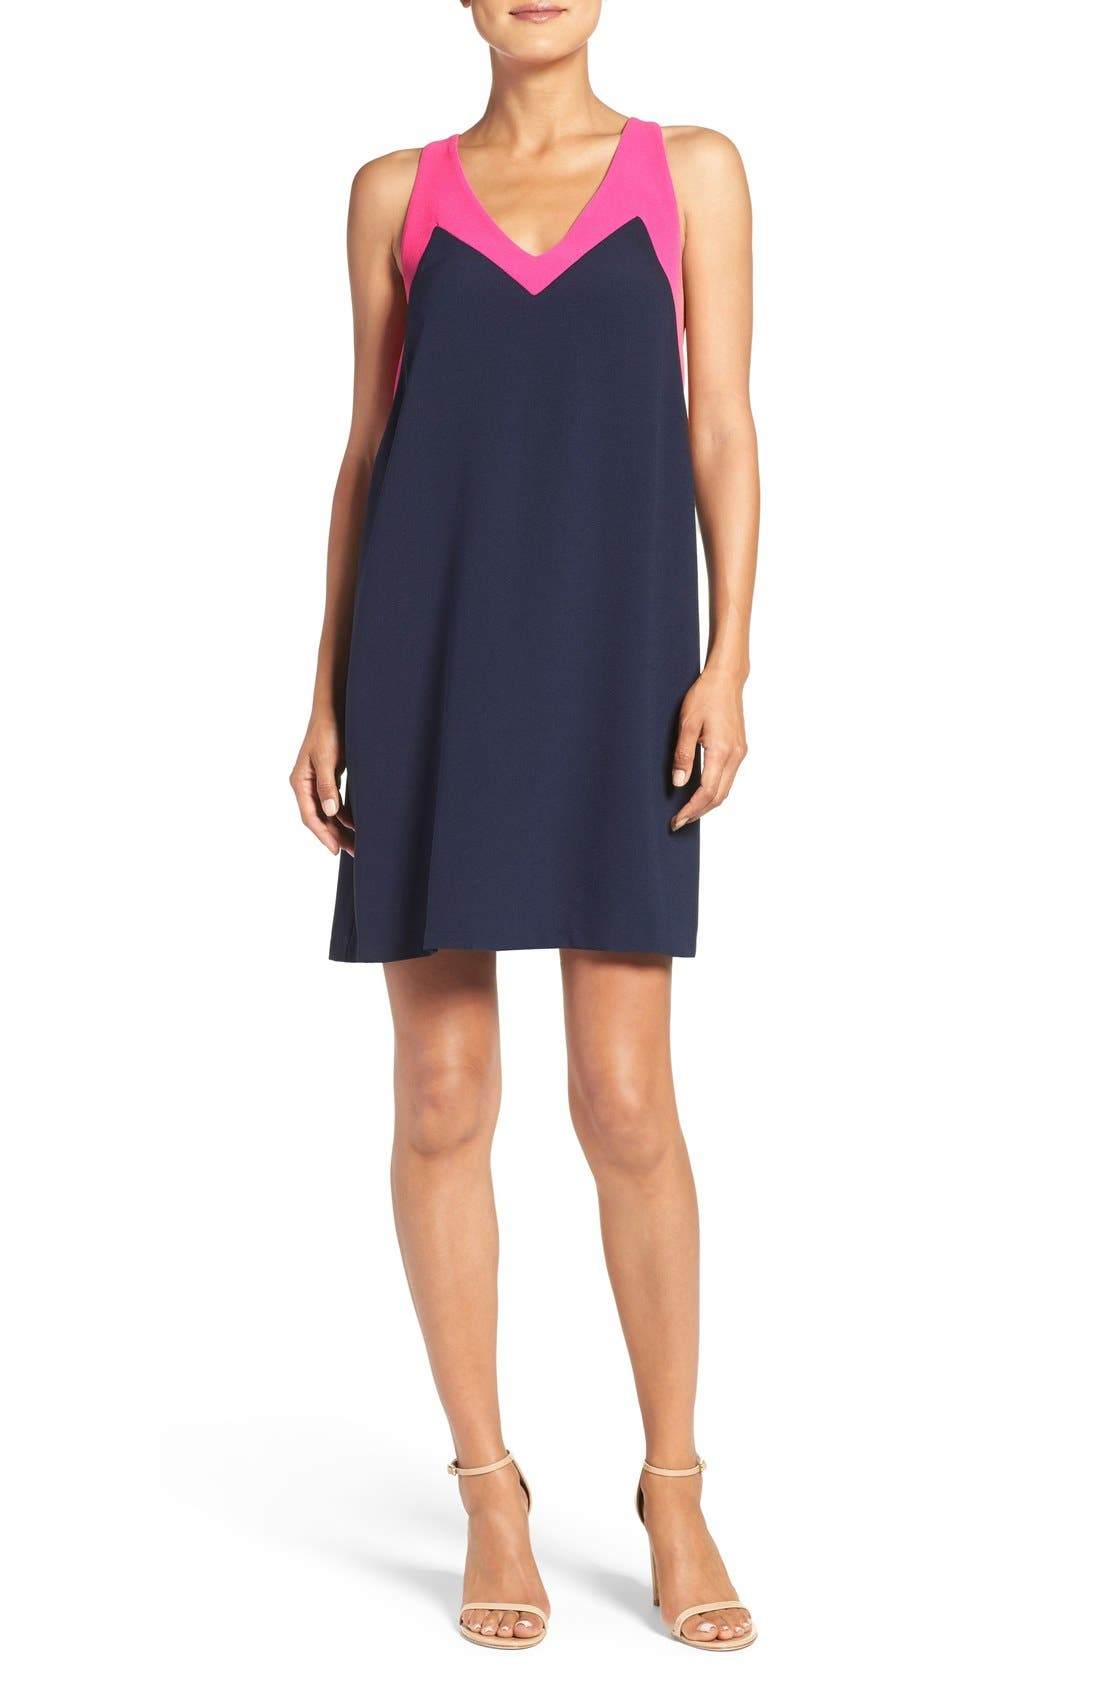 Felicity & Coco Katy Colorblock Shift Dress (Regular & Petite) (Nordstrom Exclusive)